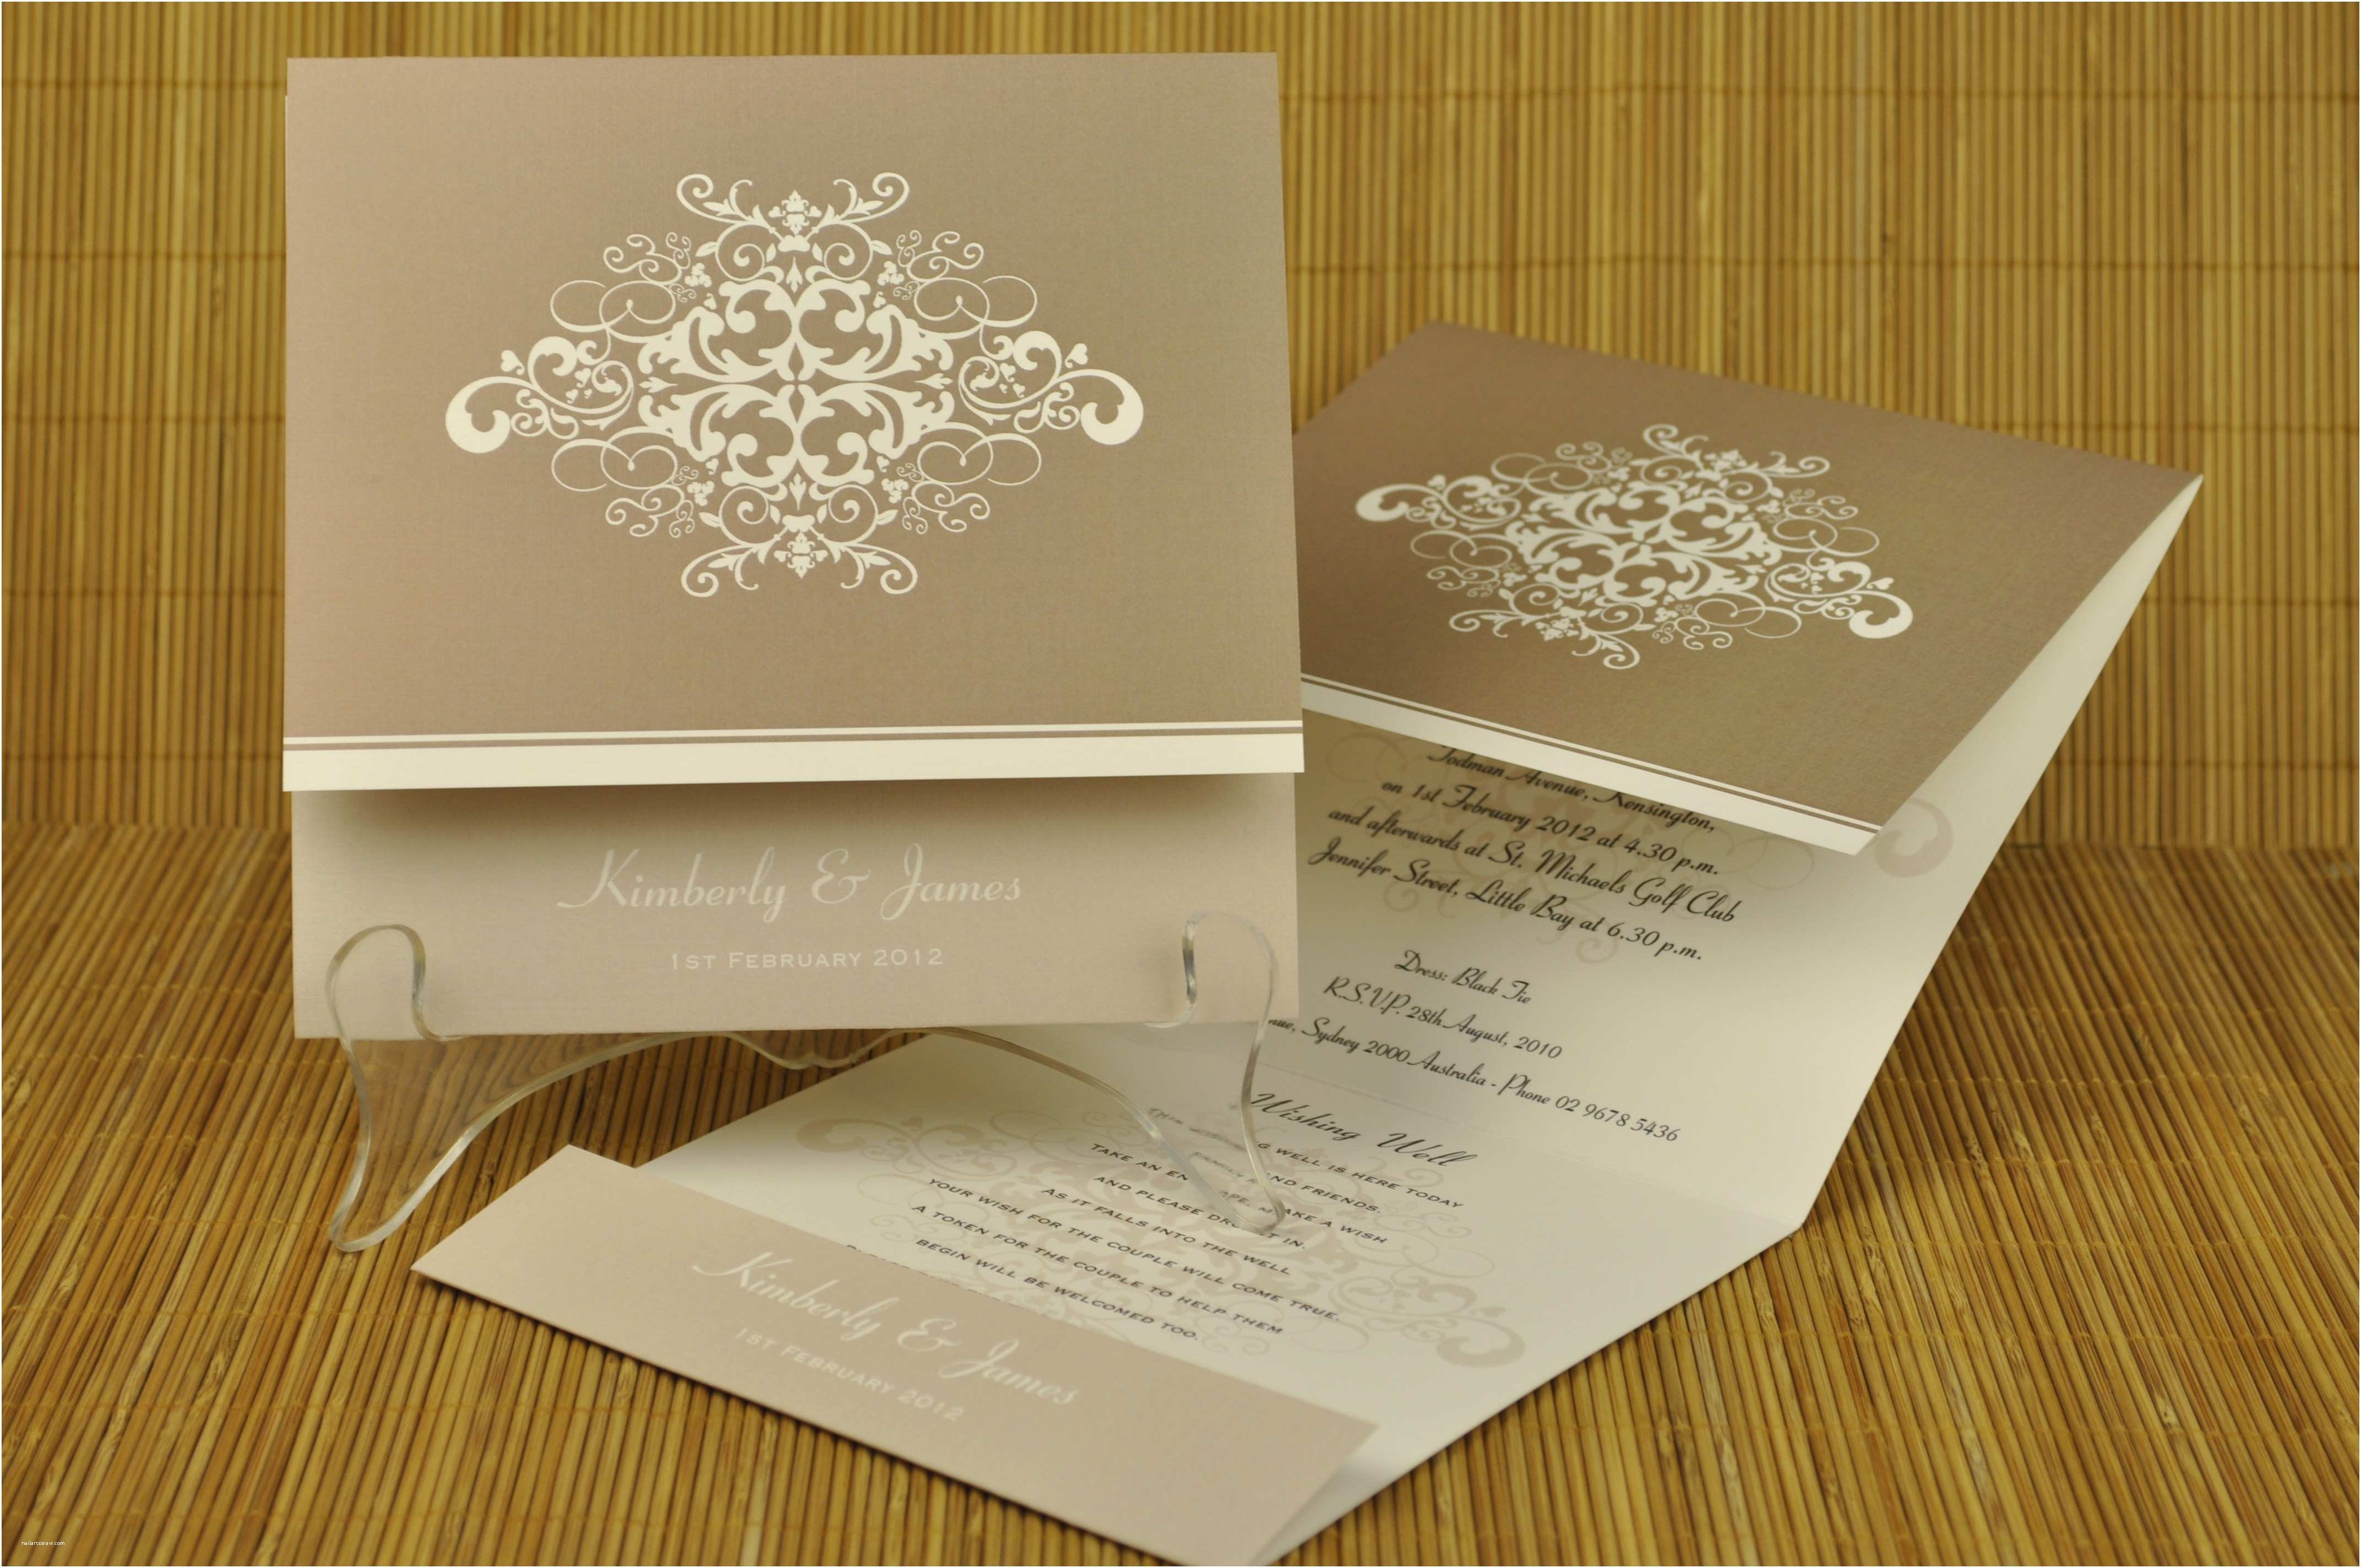 Wedding Invitation Design Images Modern and Unique Wedding Invitations